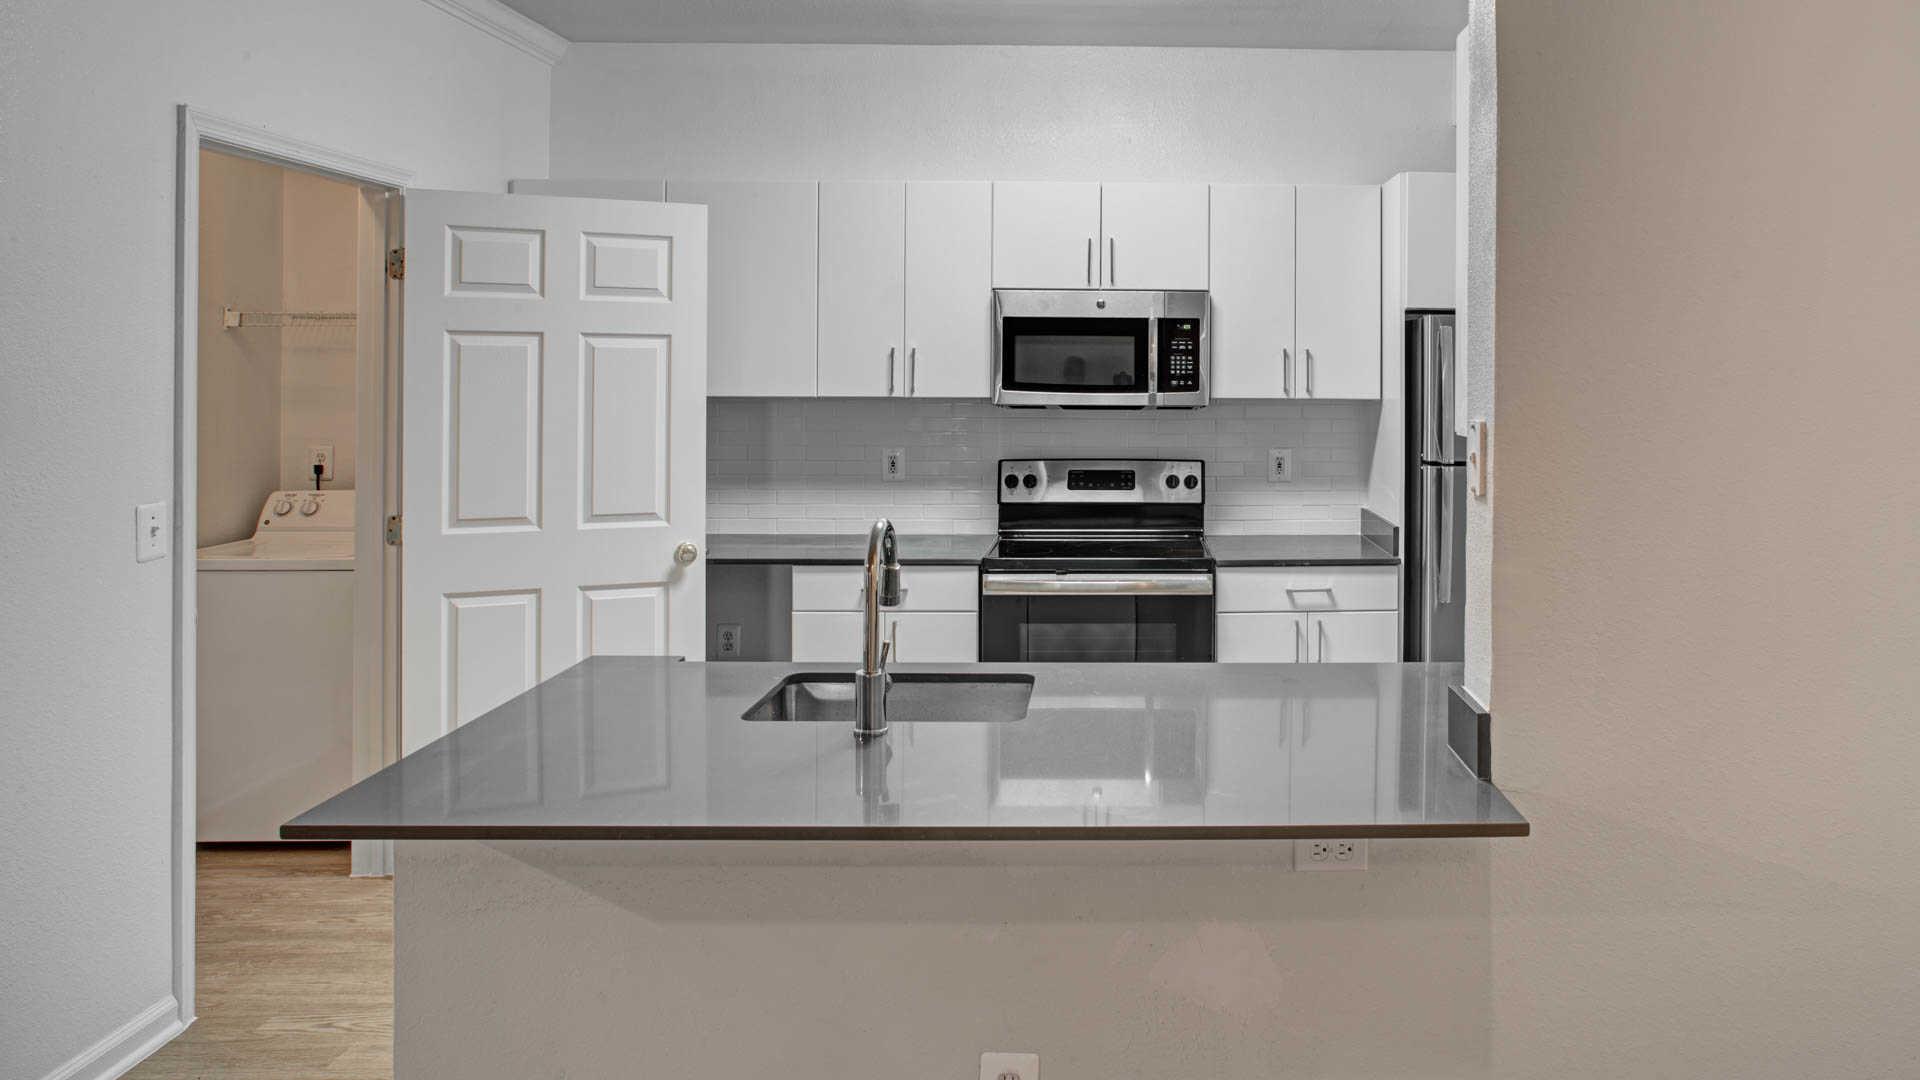 Charmant Reserve At Potomac Yard Apartments Reviews In Alexandria   3700 Jefferson  Davis Hwy | EquityApartments.com